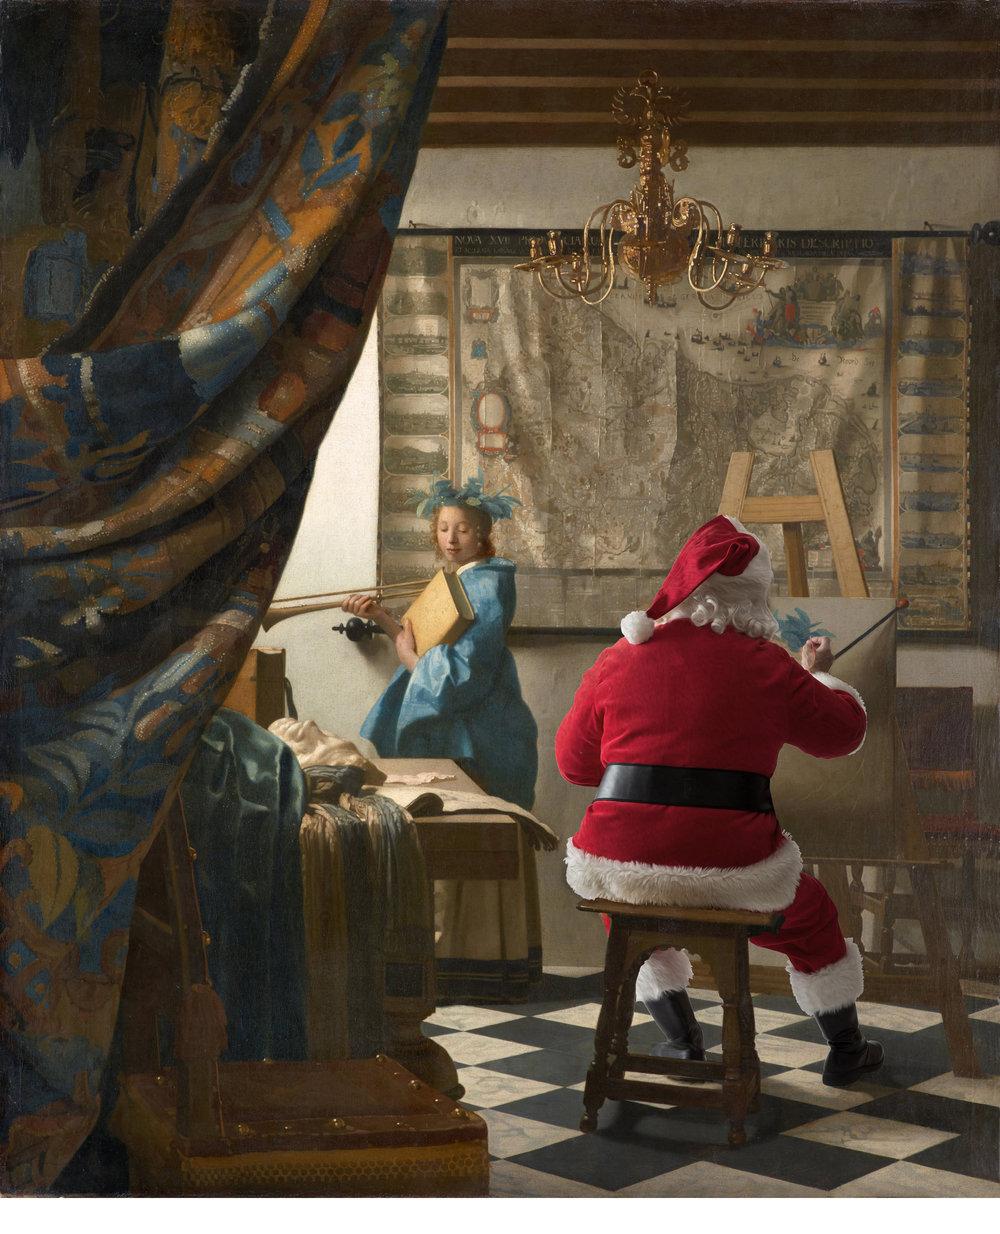 Johannes Vermeer - The Art of Painting